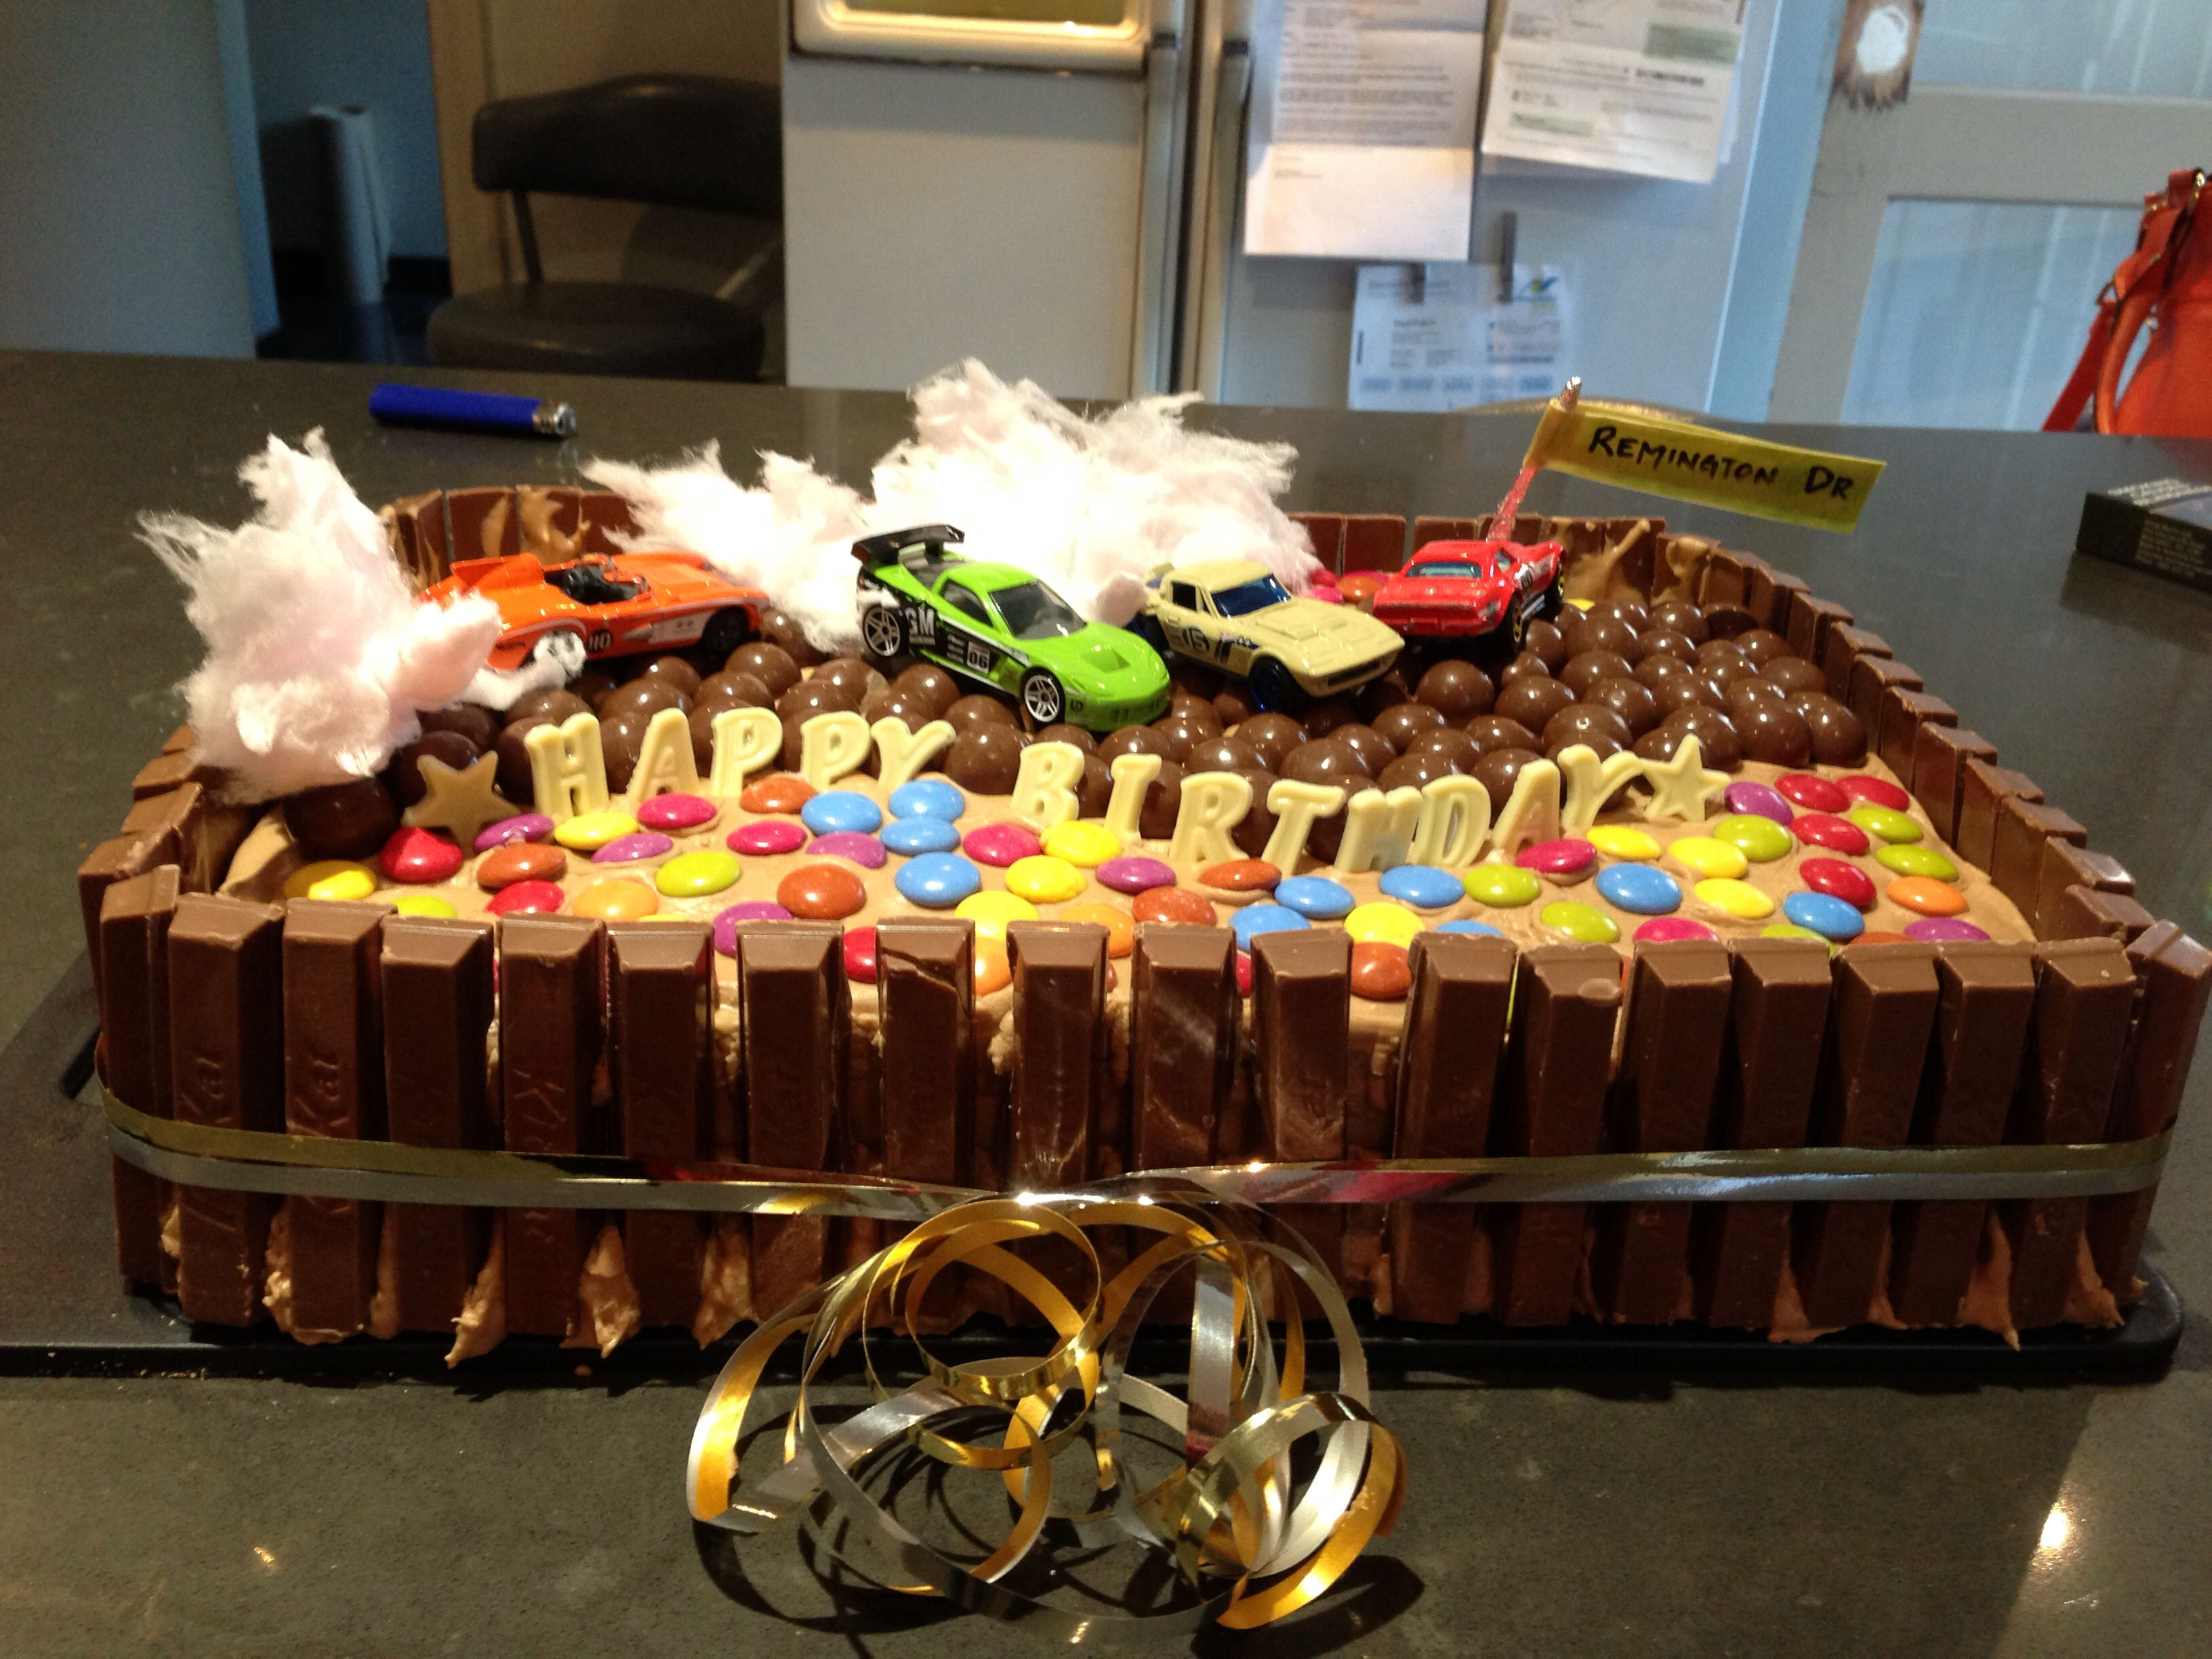 Racing car drifting cake malteasers kit Kats chocolate and ribbon